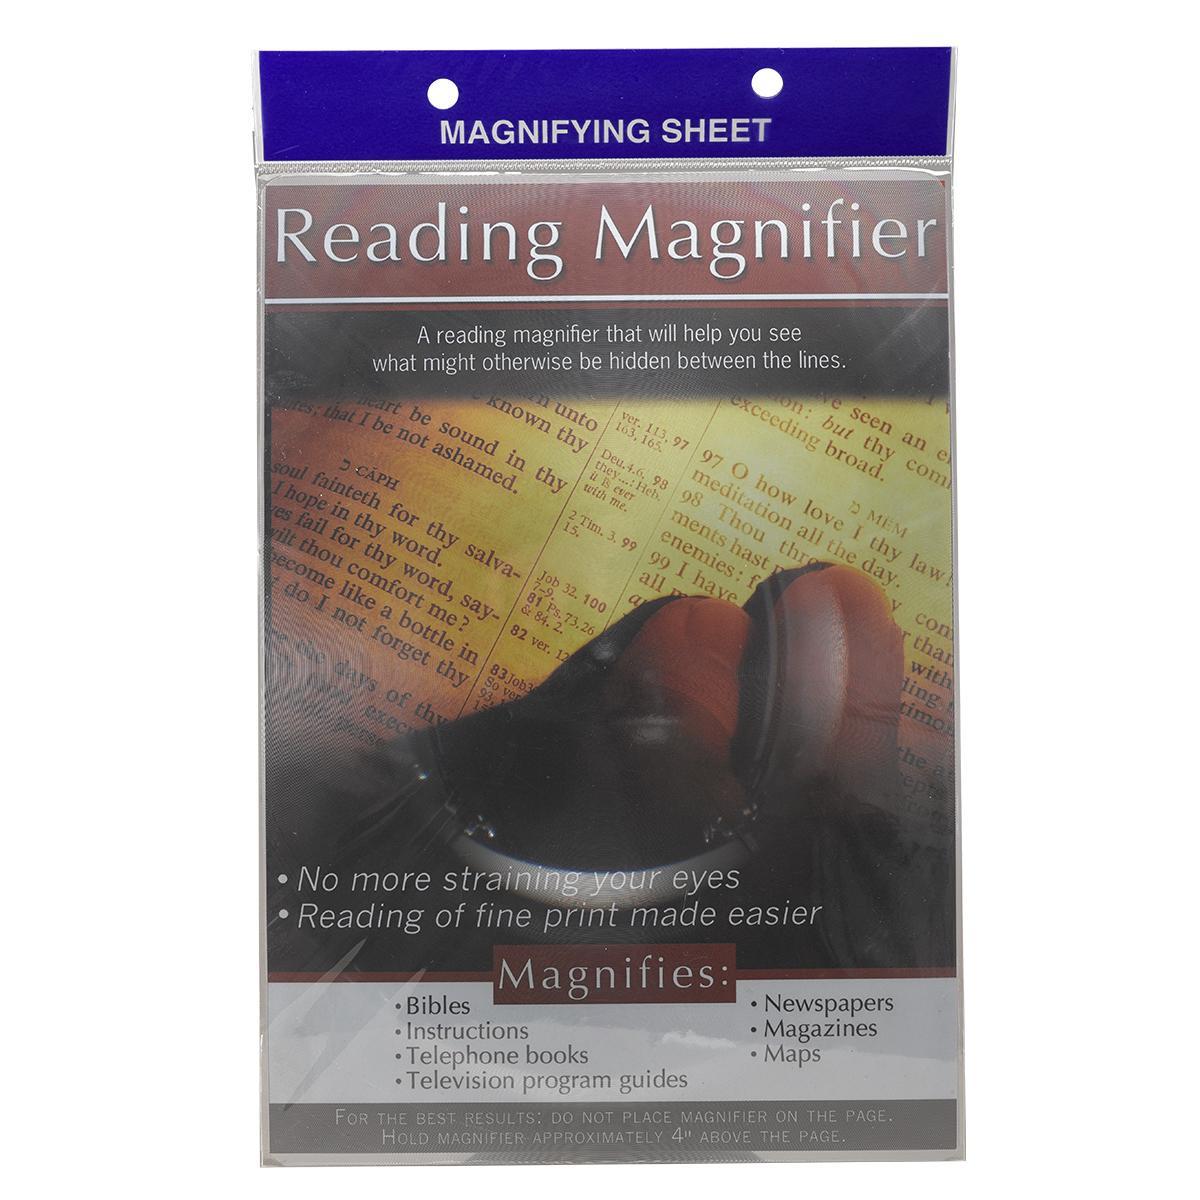 Magnifying Sheet - Page